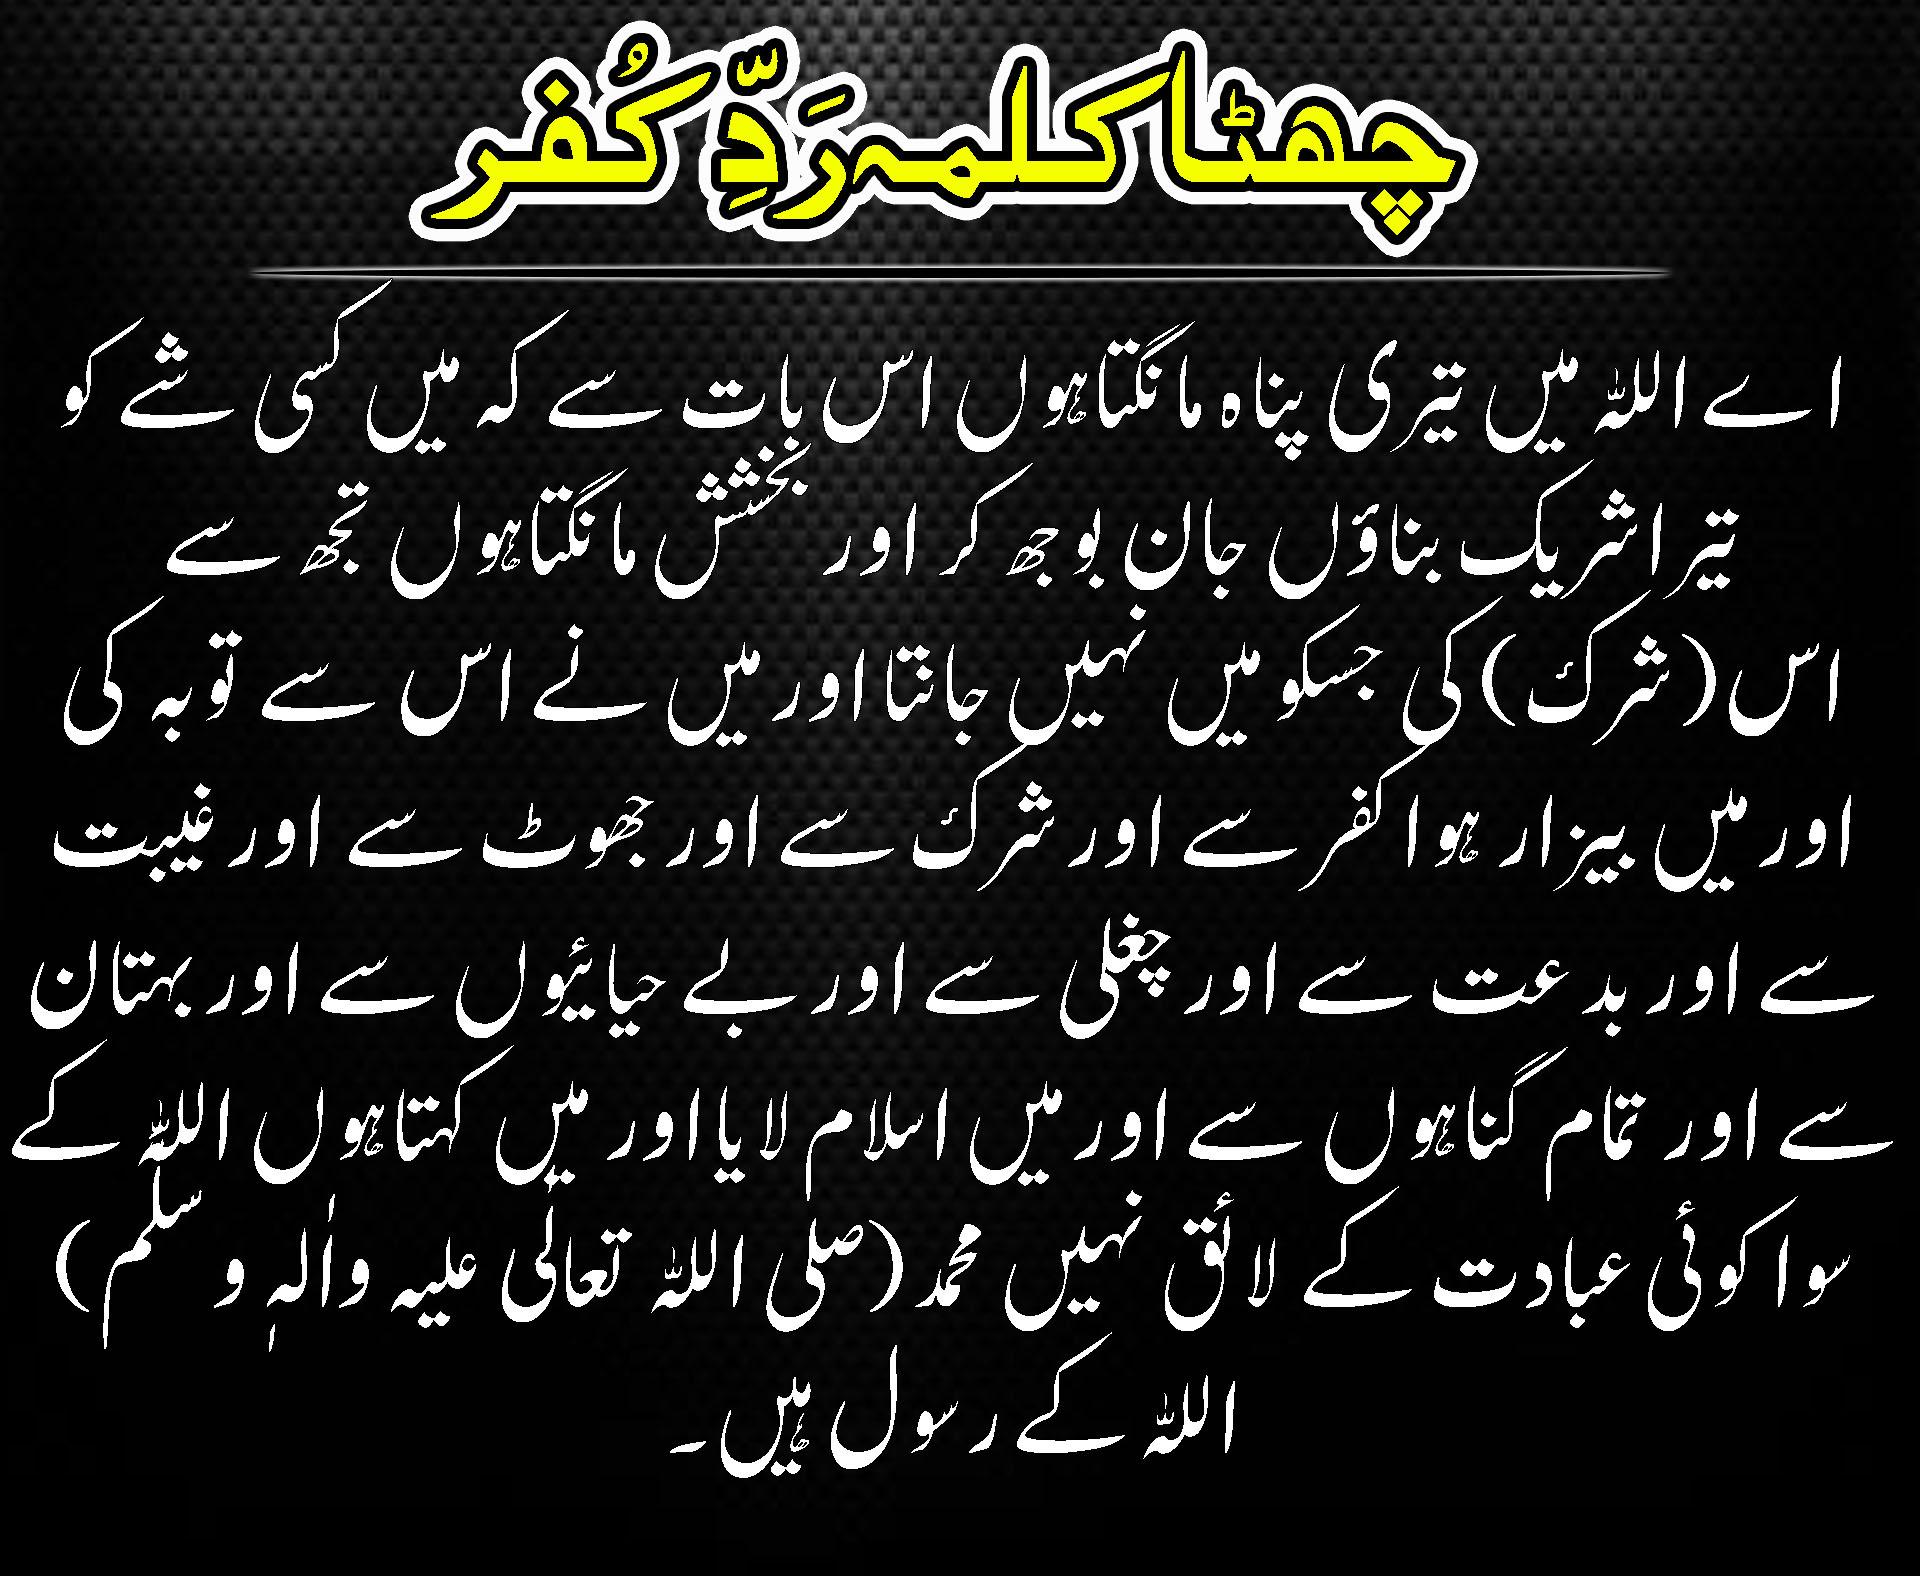 6 Kalima Radd E Kufar With Urdu Translation Faiz E Islam